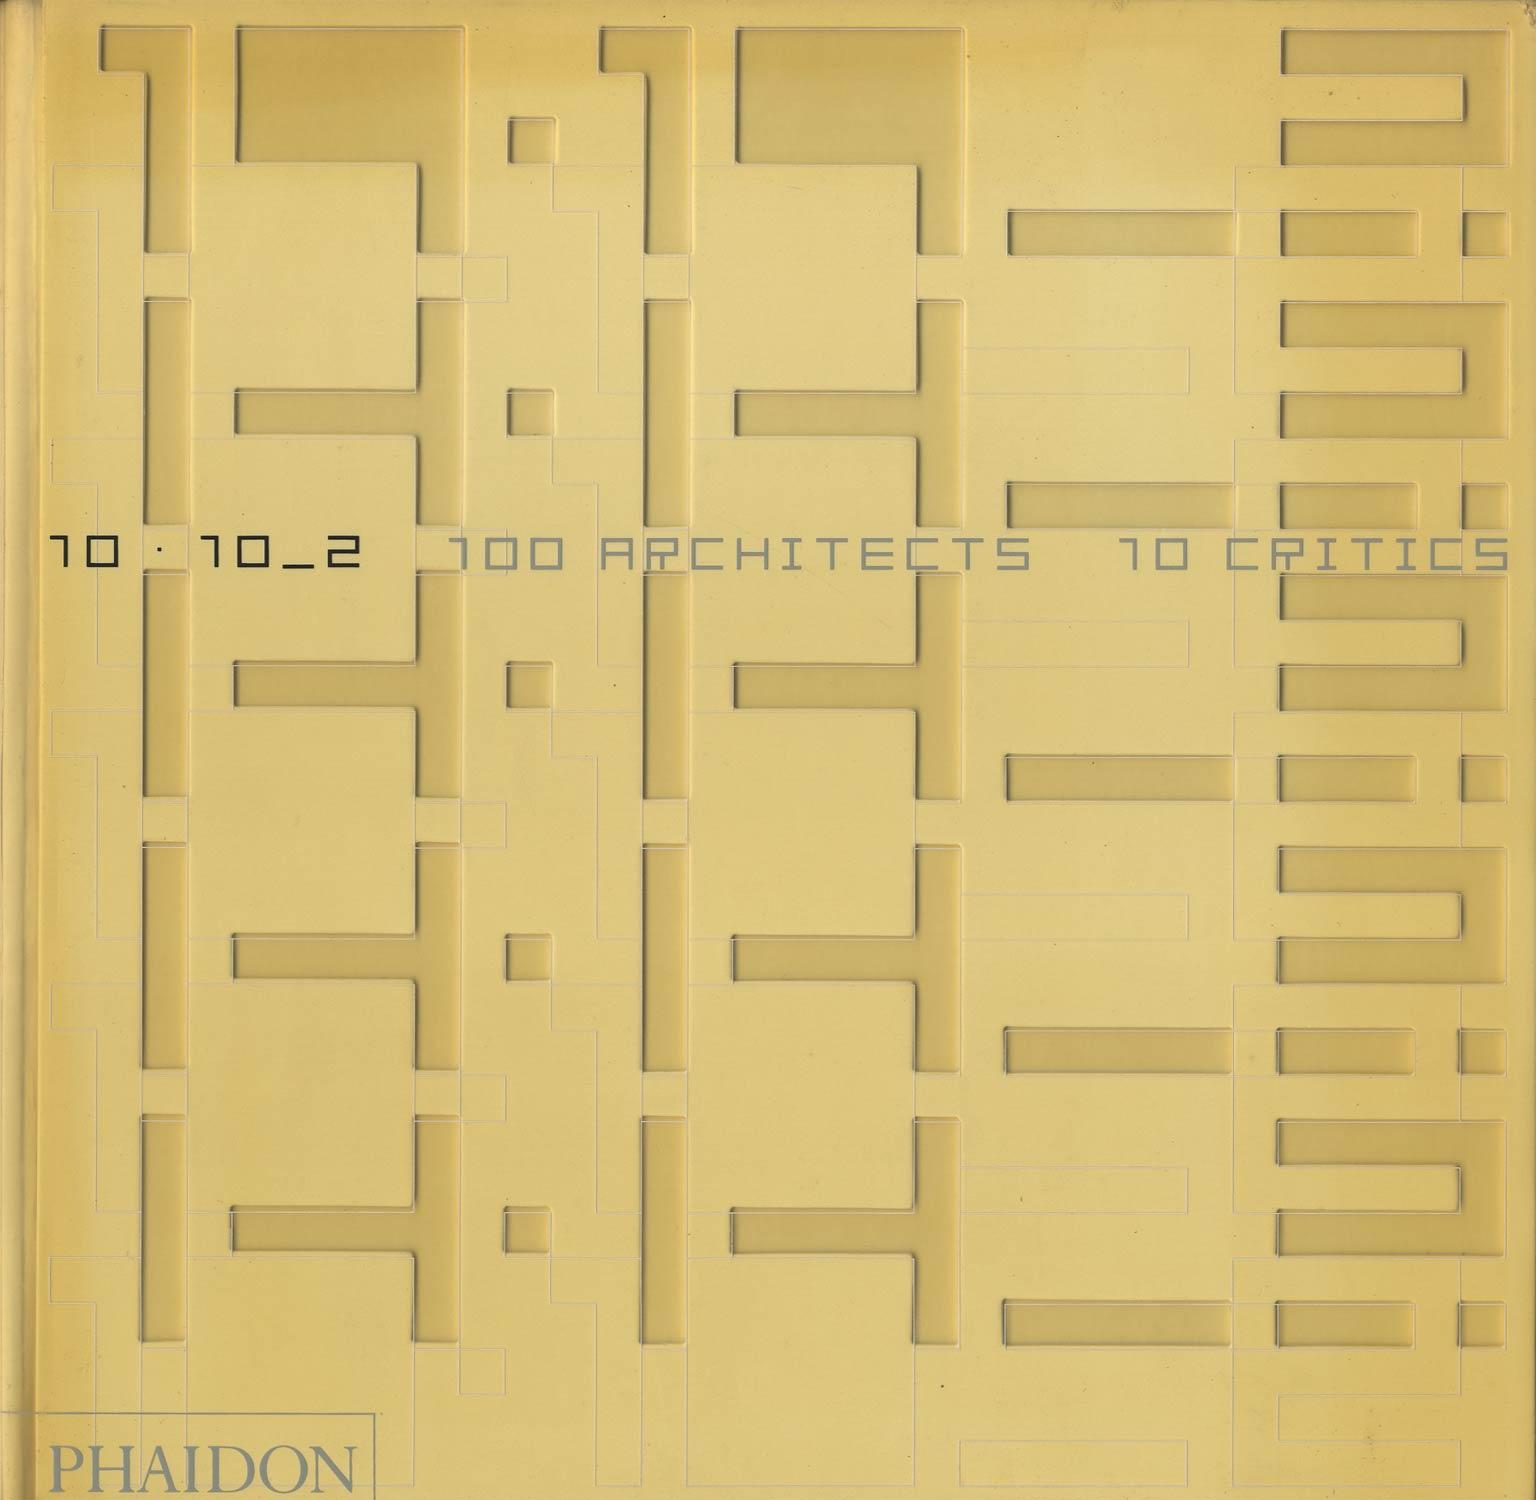 10×10_2 100 architects 10 critics[image1]